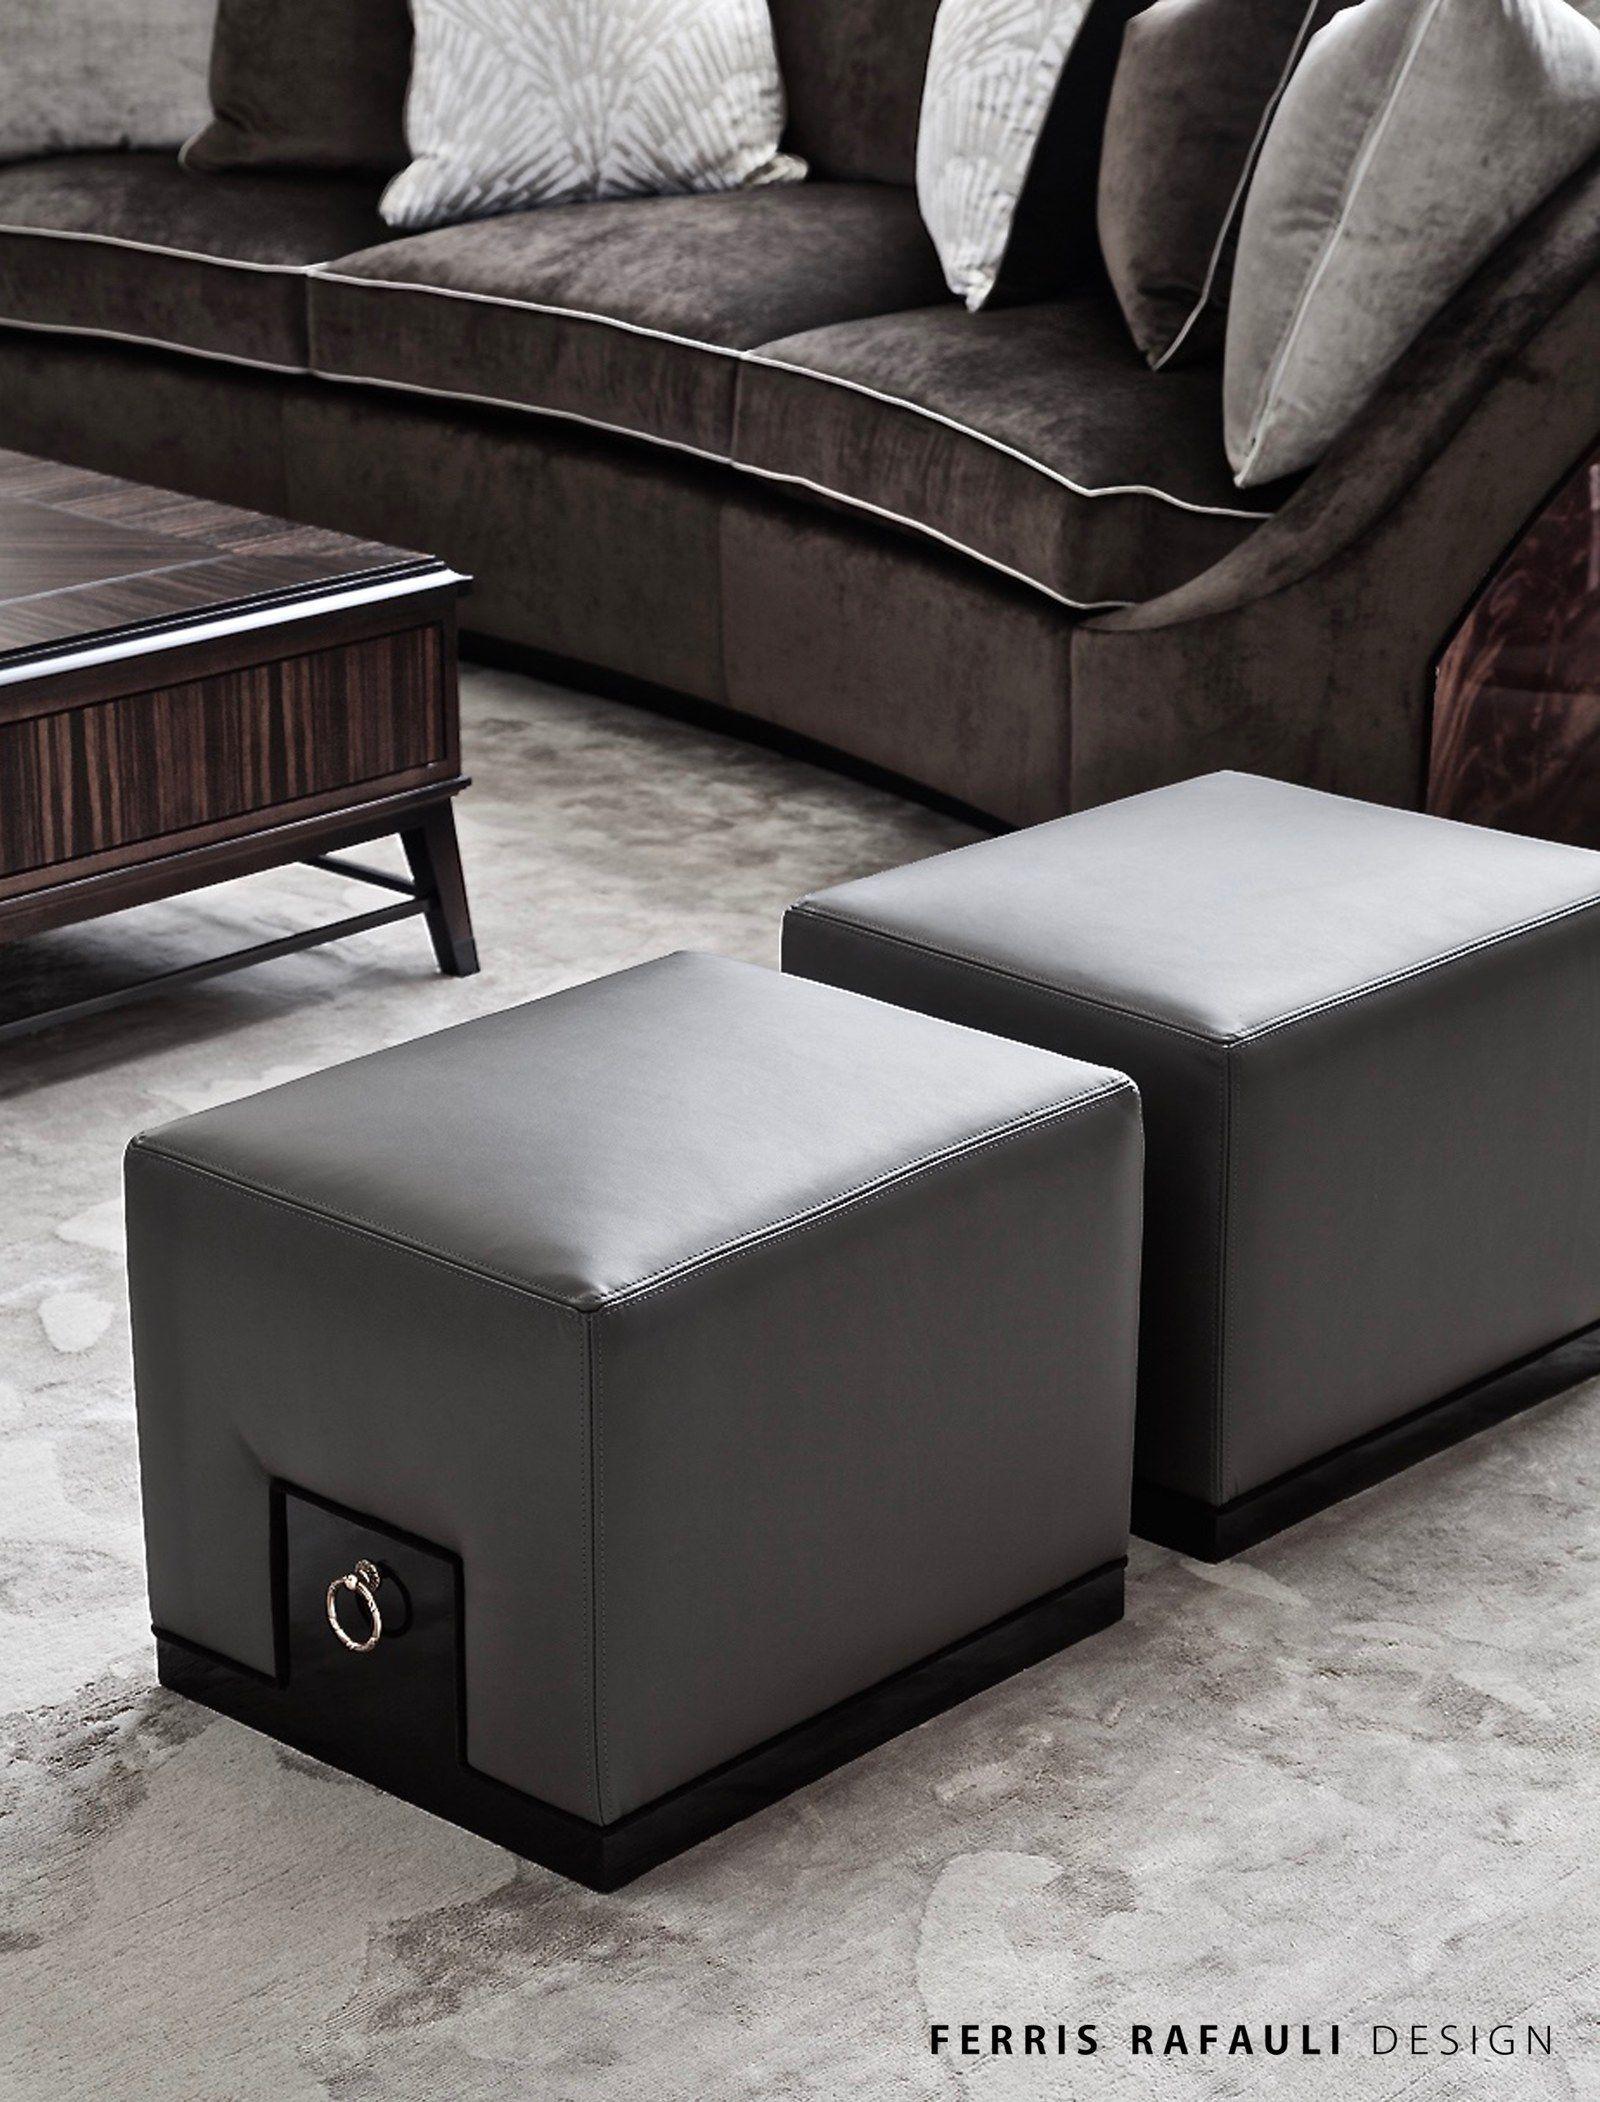 Ferris Rafauli | Architecture by Ferris Rafauli | Furniture ...